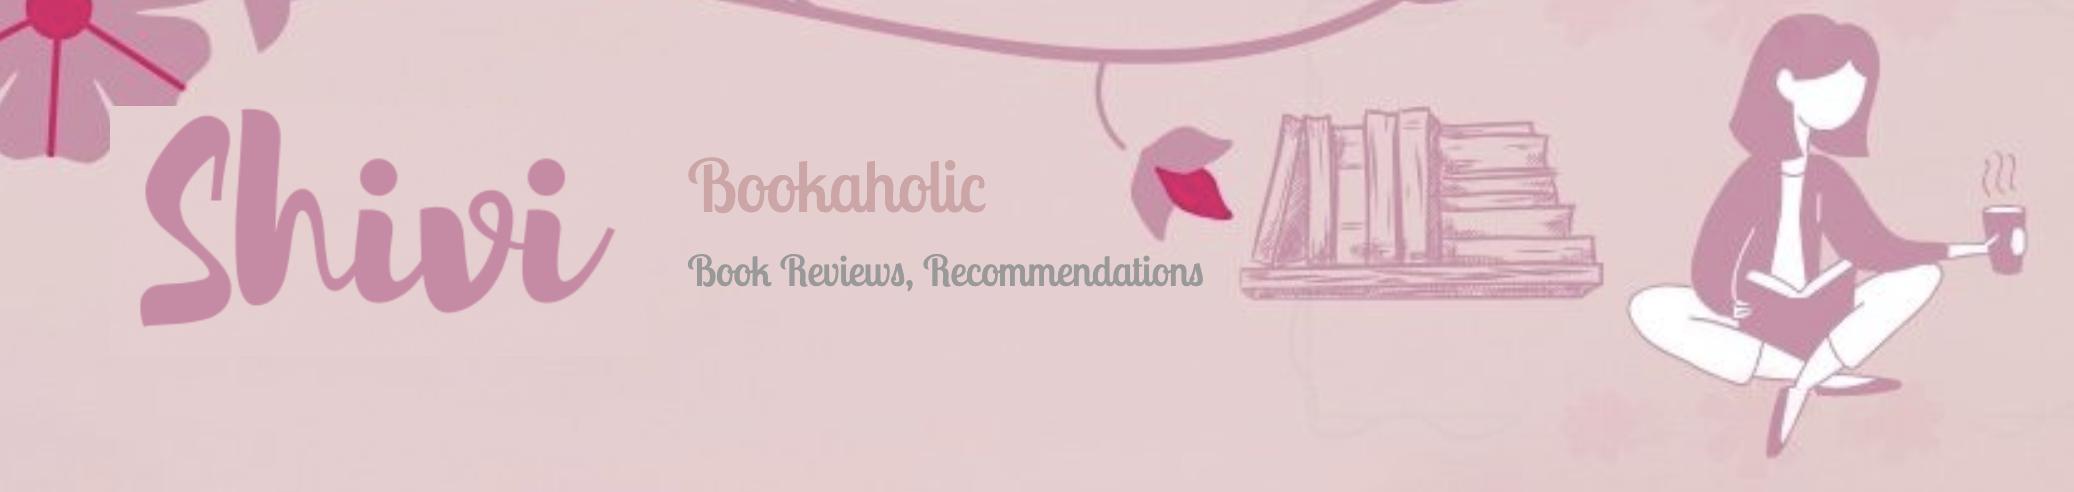 Bookacholic